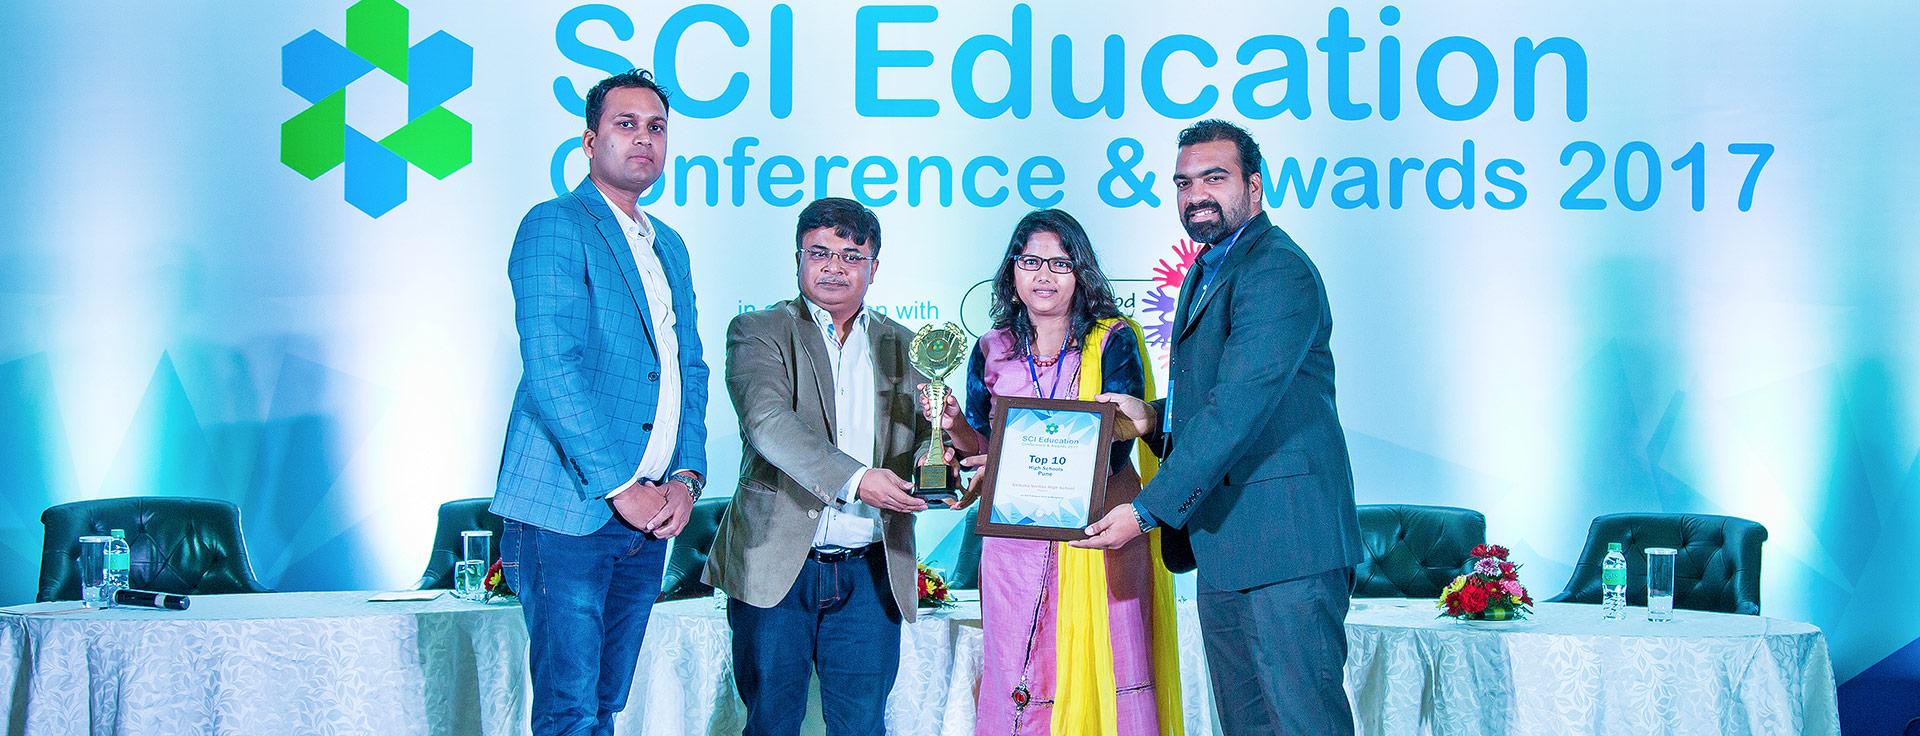 Award Winning School